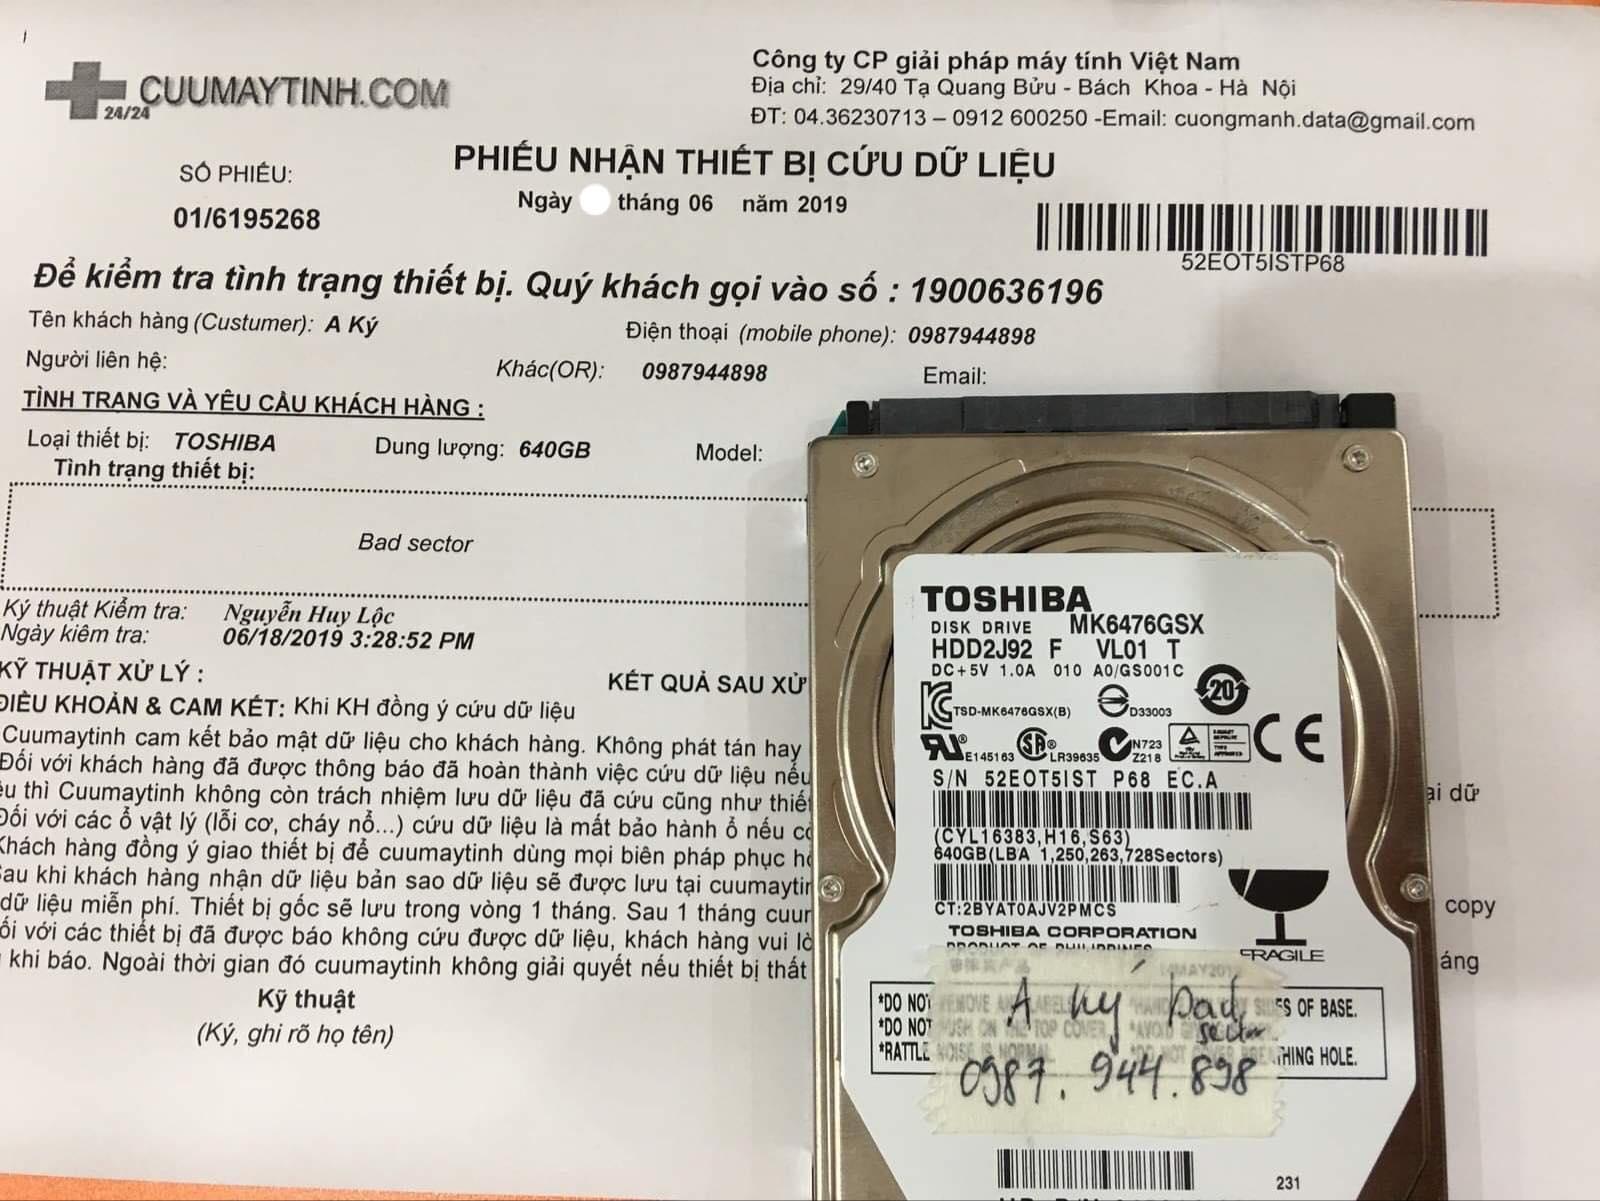 Khôi phục dữ liệu ổ cứng Toshiba 640GB bad sector 22/06/2019 - cuumaytinh